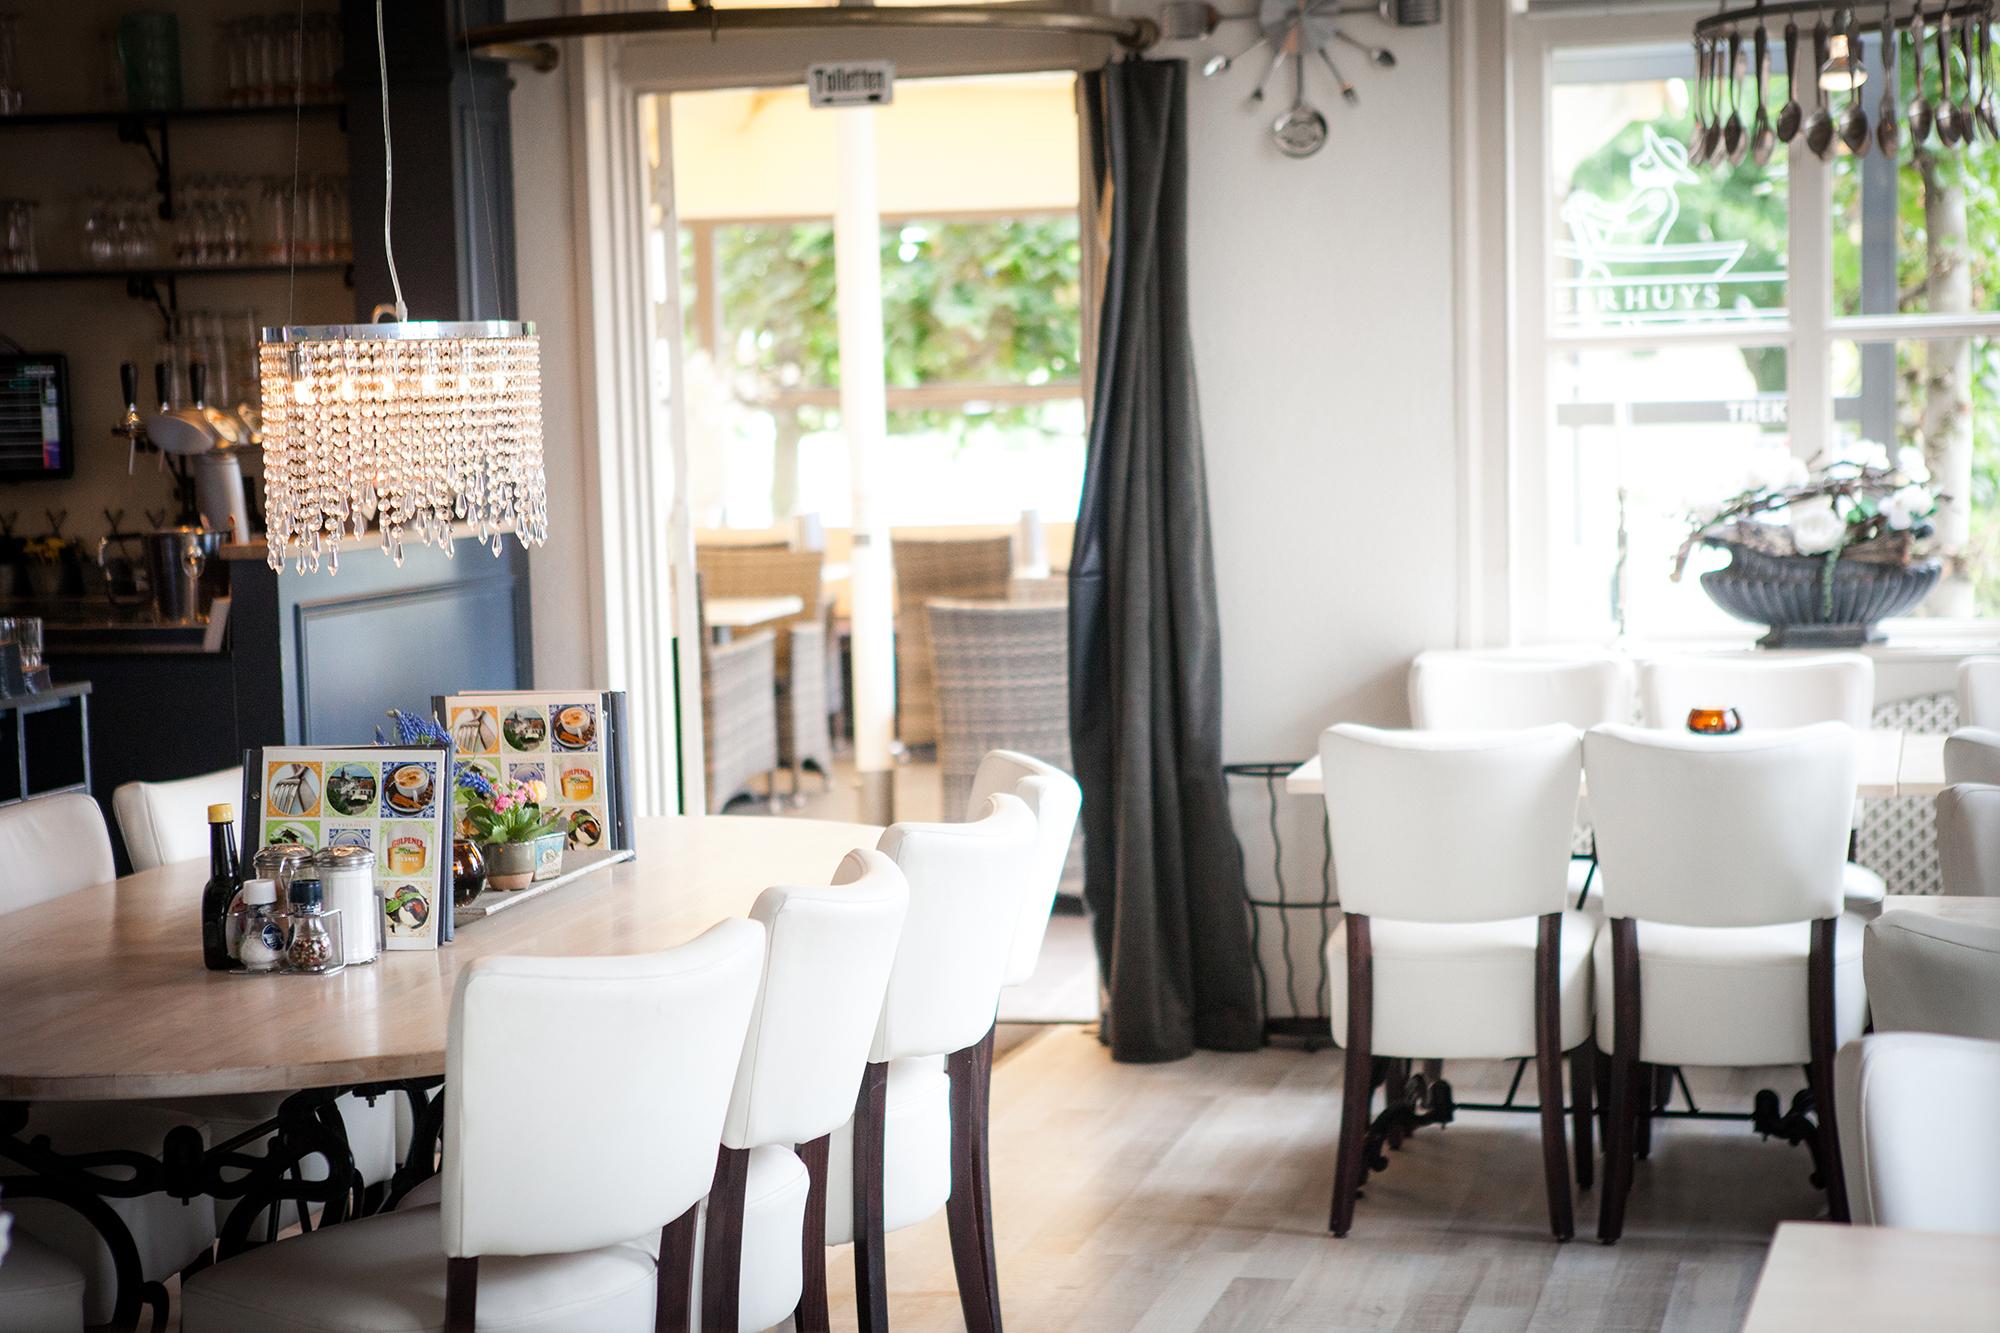 003-restaurant-veerhuys-leerdam